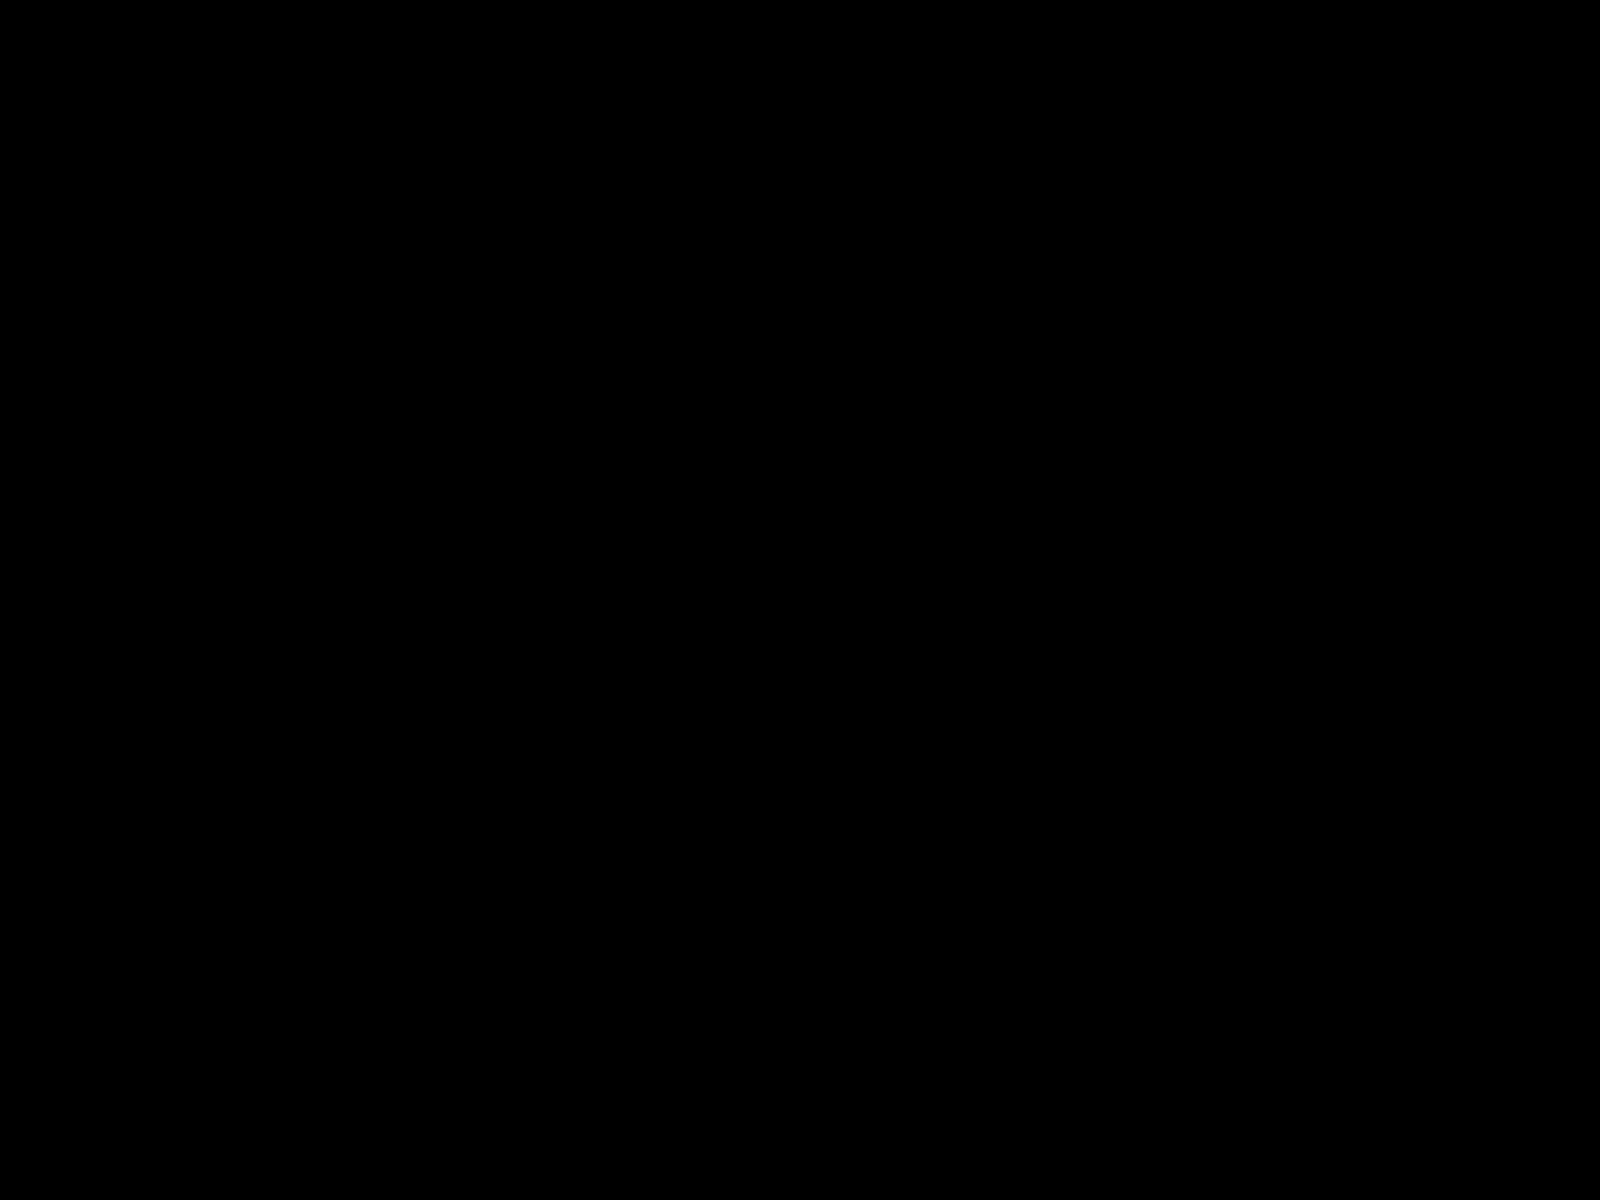 Blue Rooster Stencil SVG Clip arts